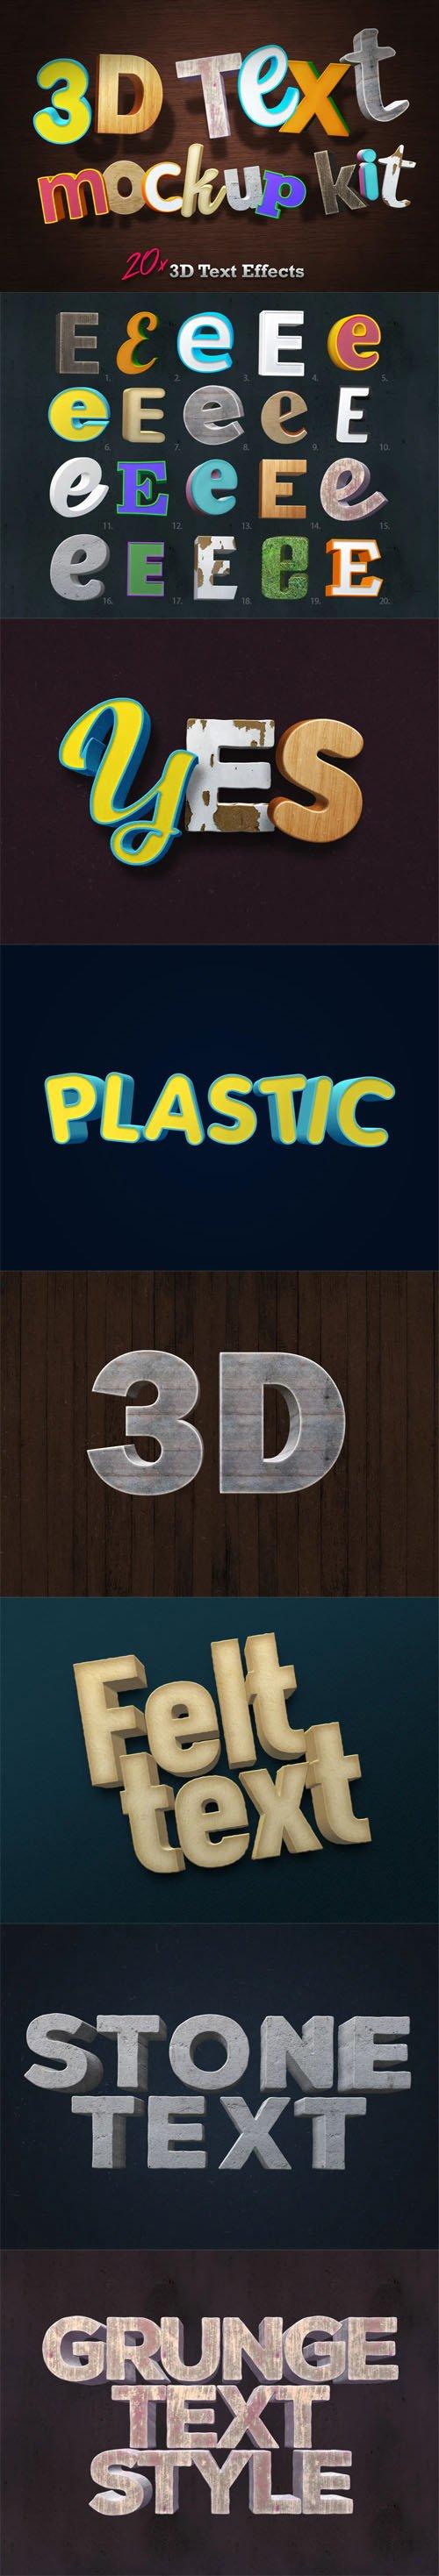 3D Text Mockup Kit - 20x 3D Text Effects